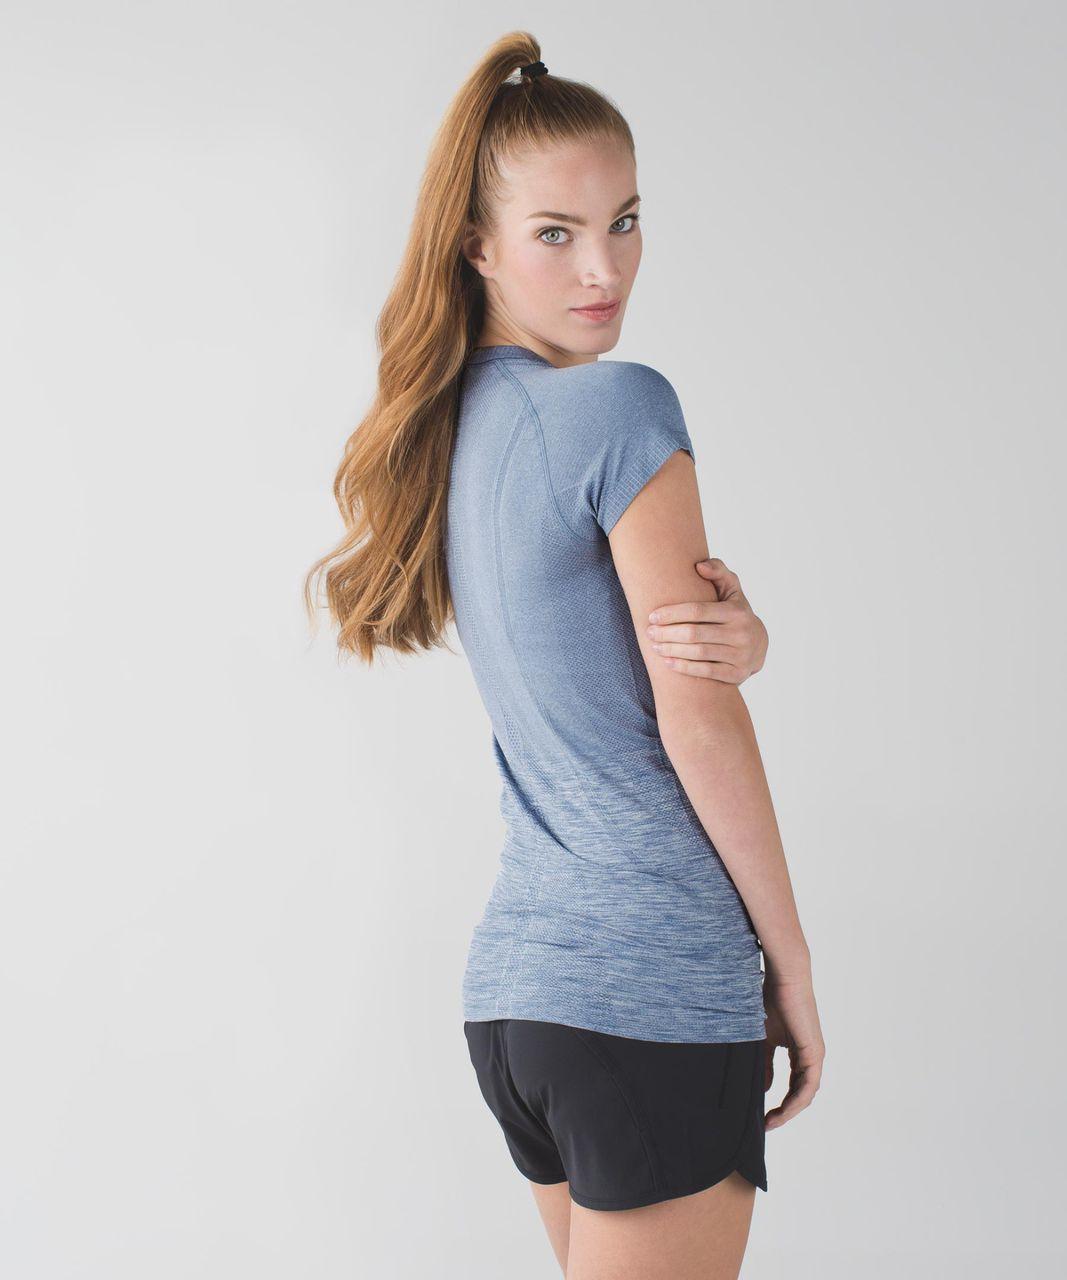 Lululemon Swiftly Tech Short Sleeve Crew - Heathered Blue Denim